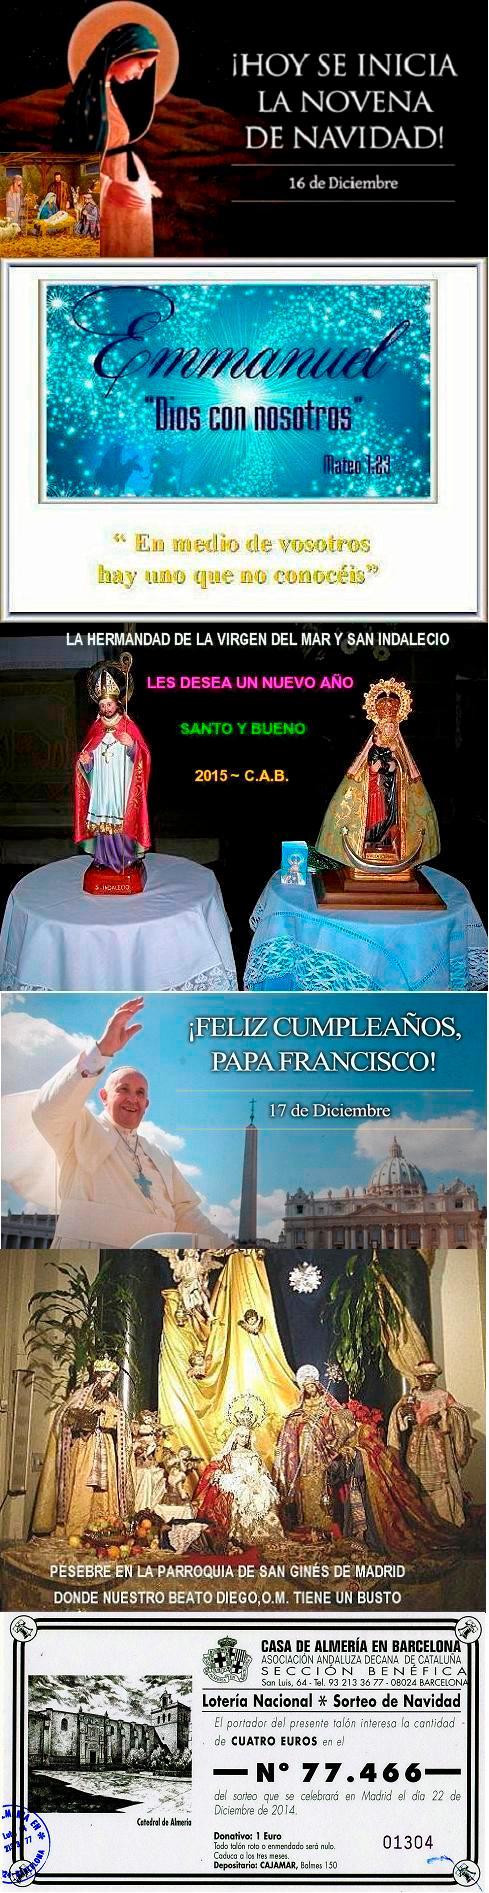 20141223131008-novena-de-navidad-2014papal-reyes2015-.jpg